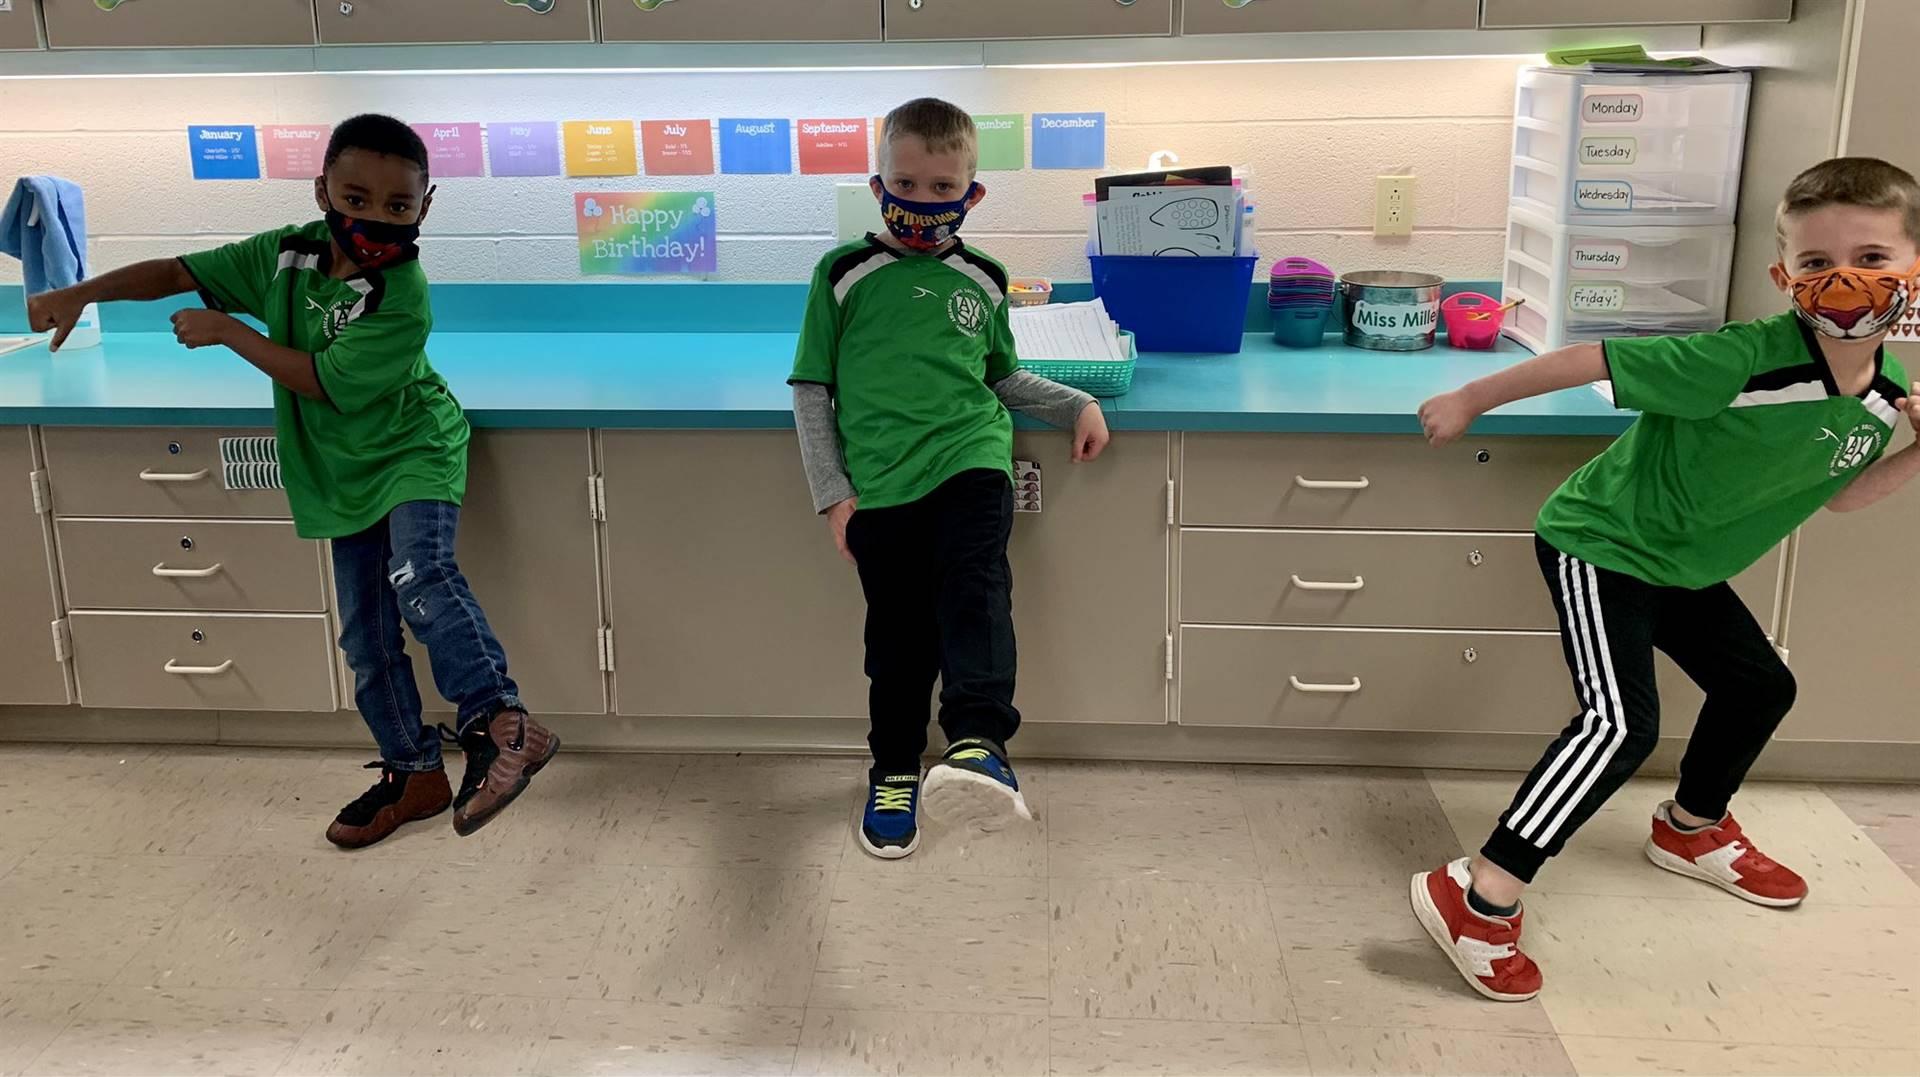 three students wearing matching green shirts